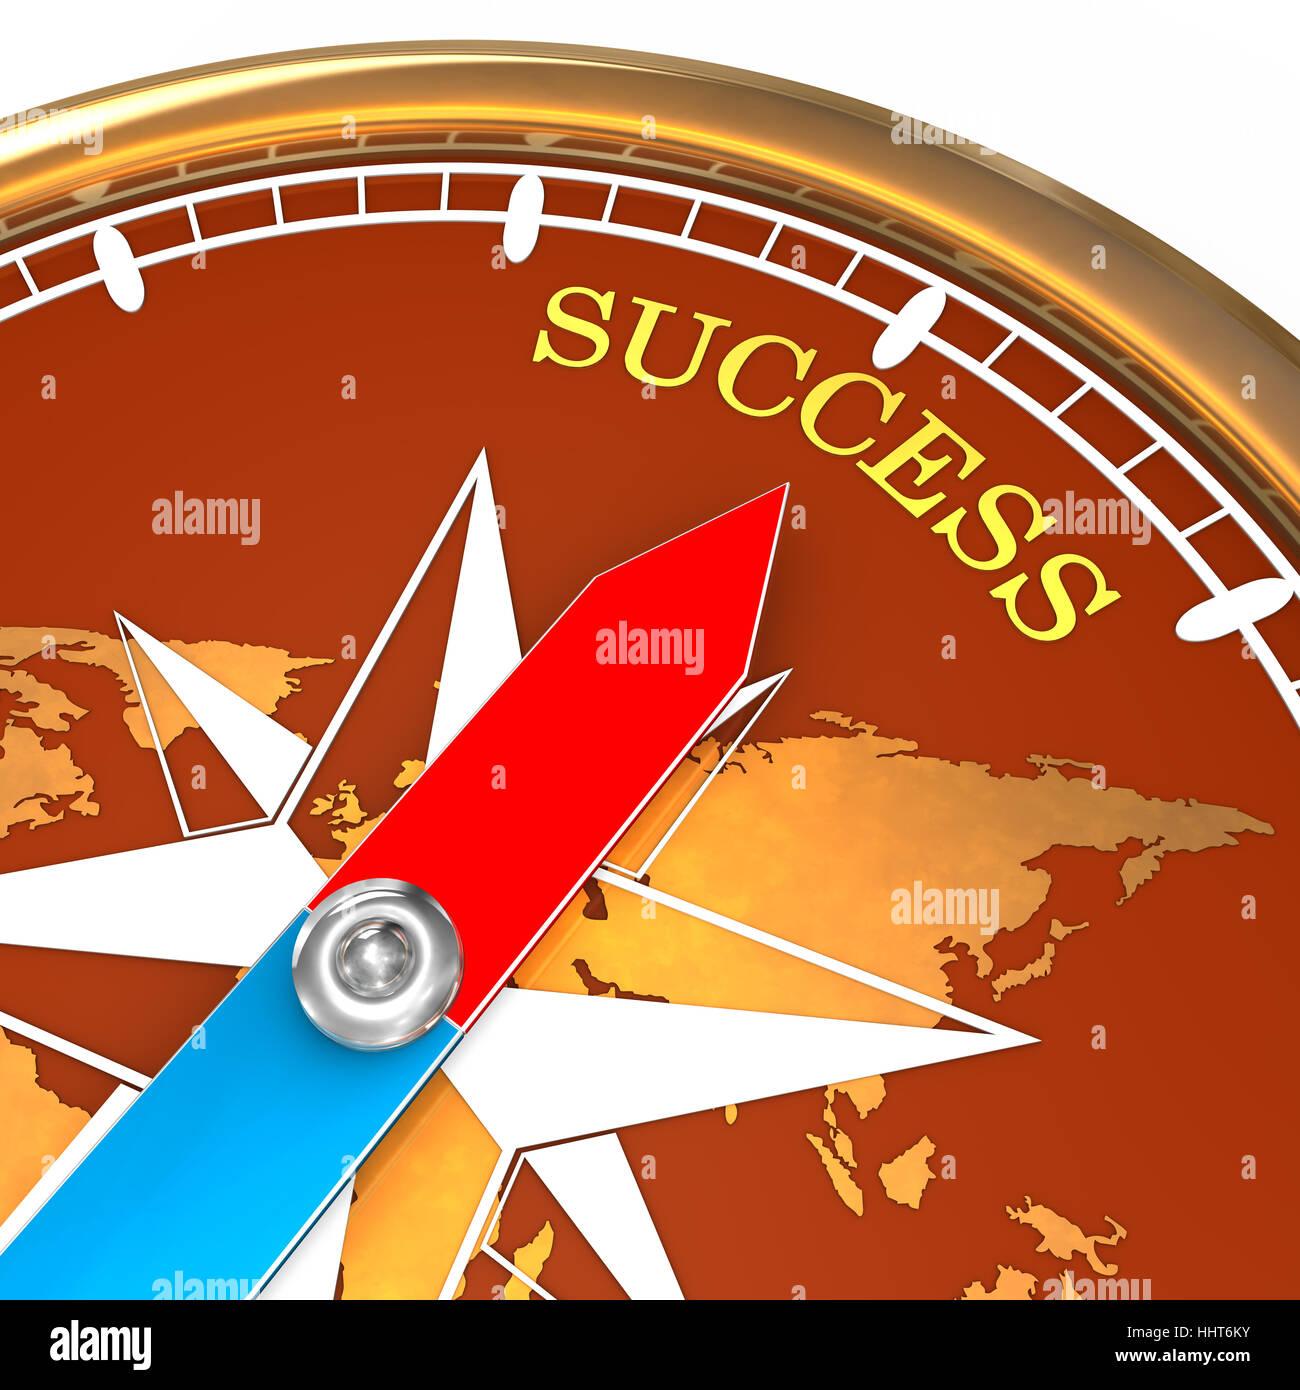 Degree Longitude Stock Photos Images Alamy 360 Compass Diagram Success Achievement Course Prosperity Victory Win